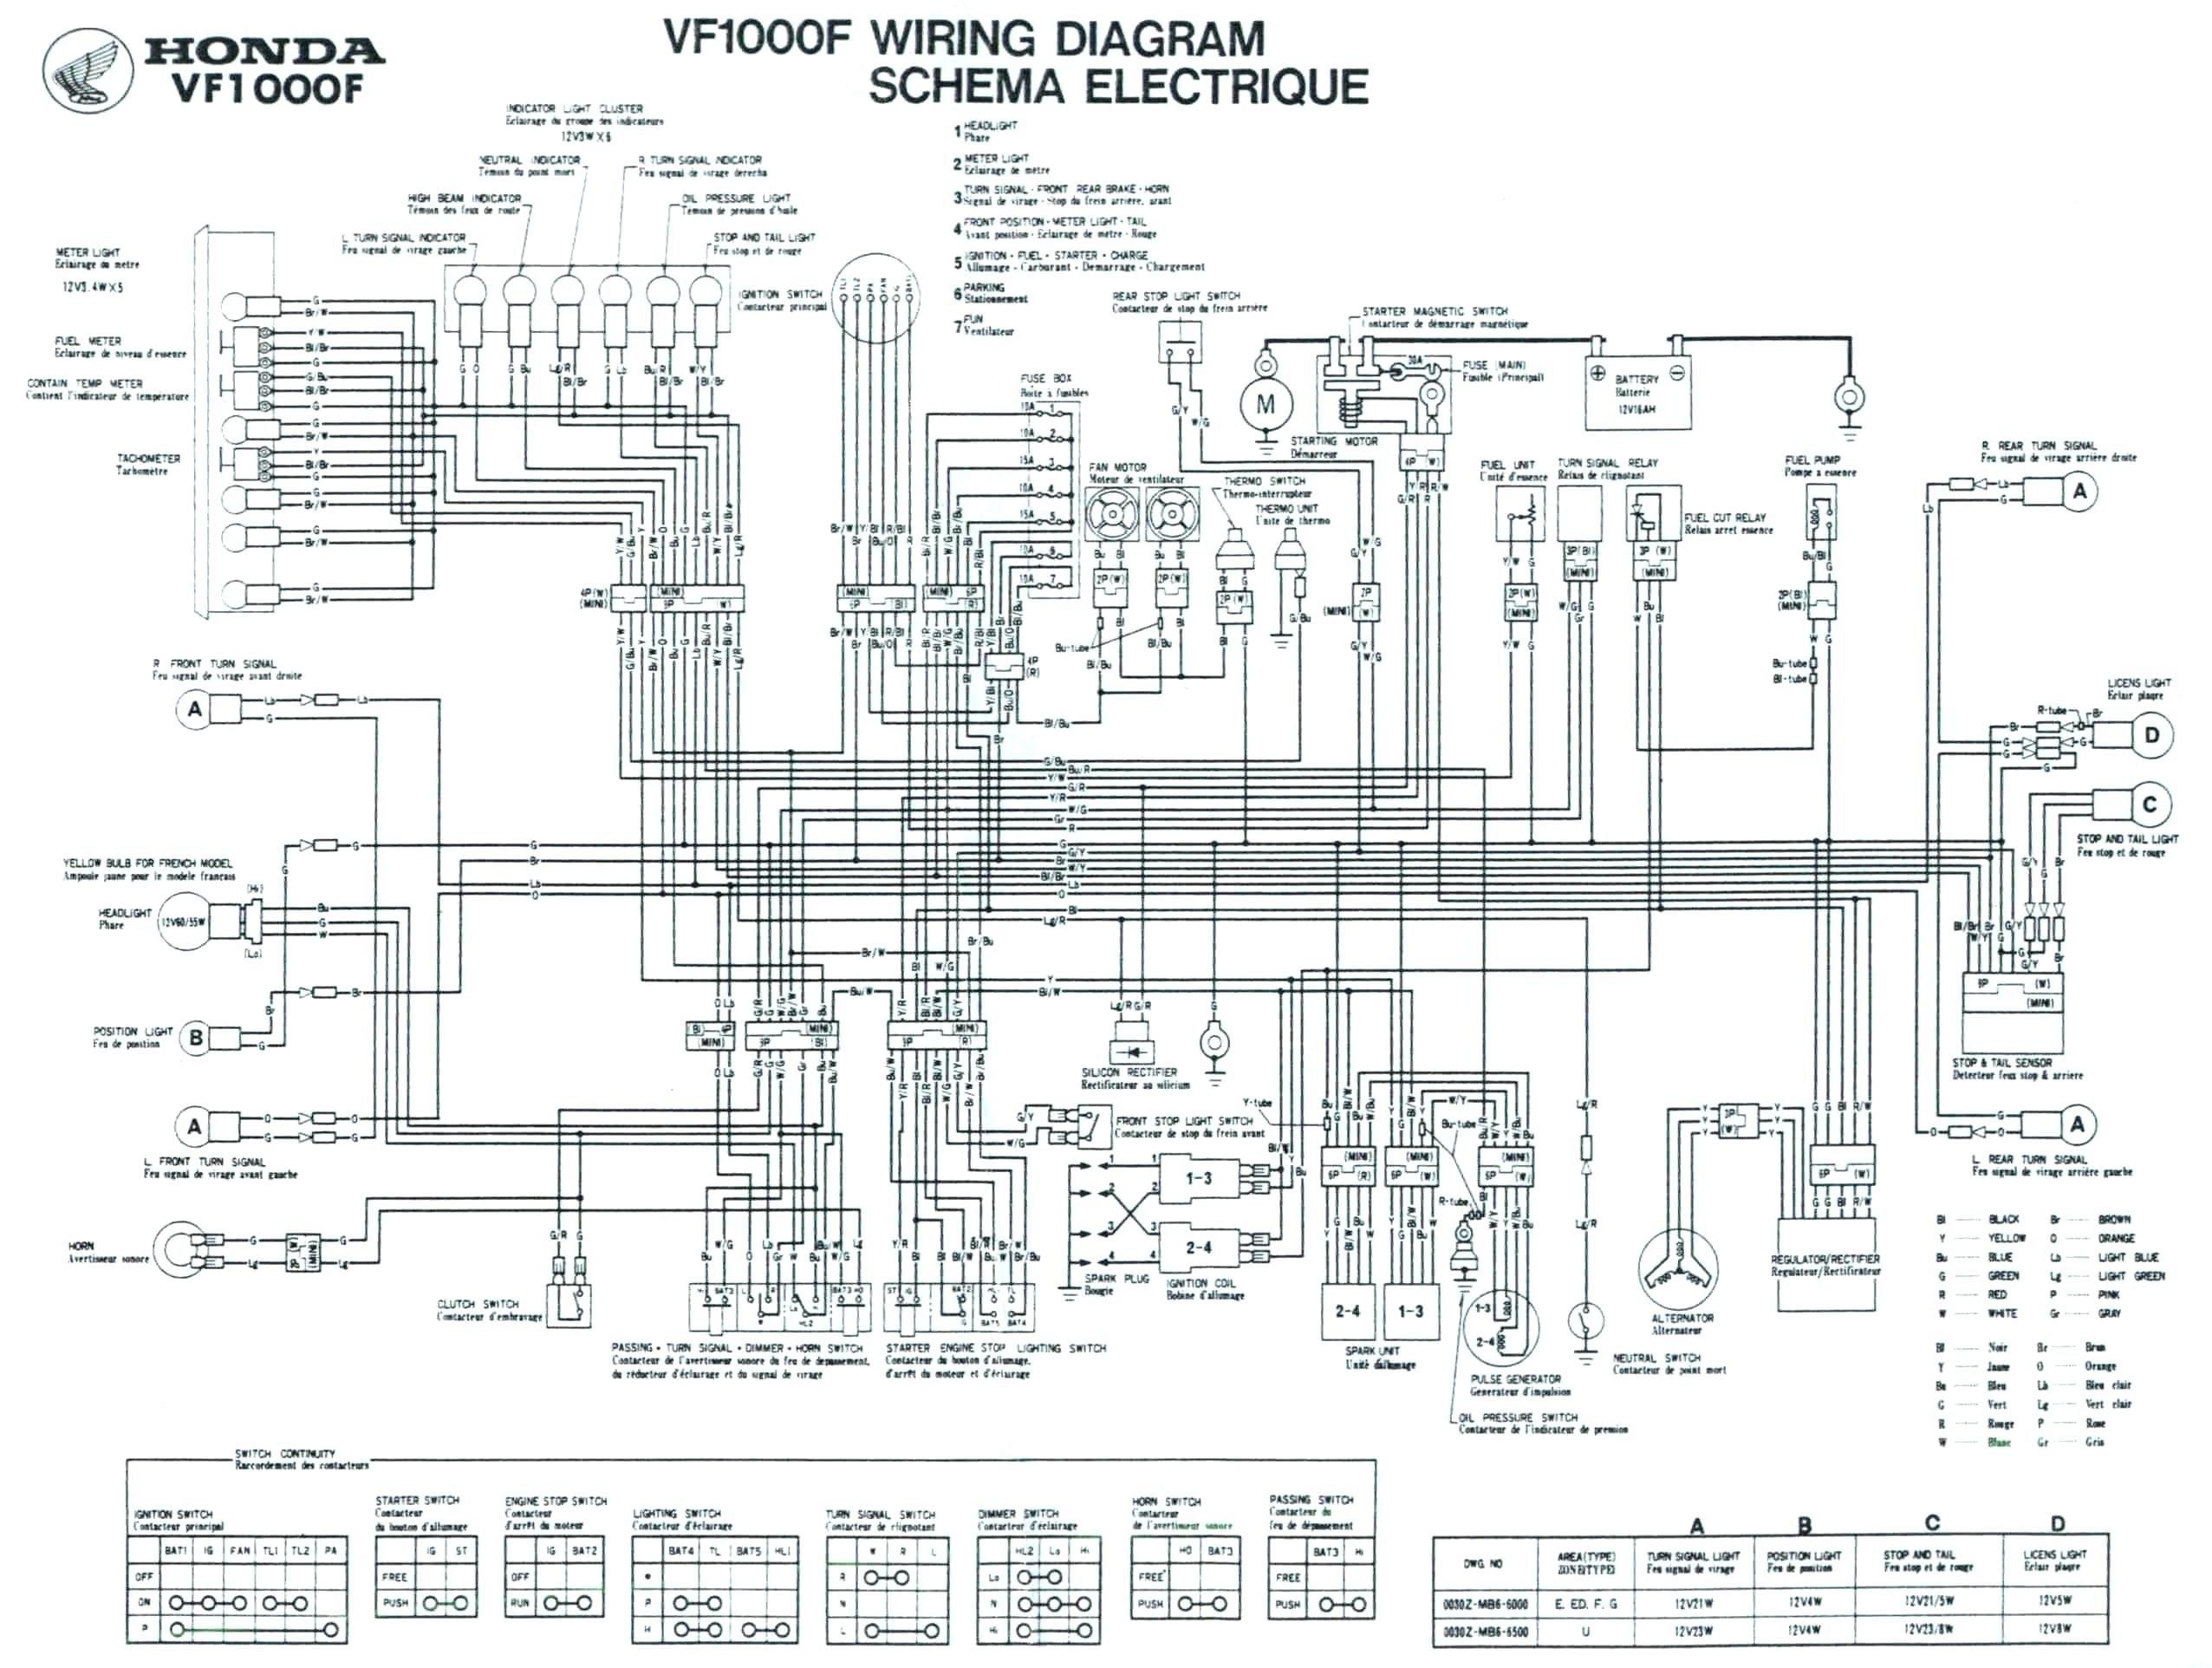 YF_4084] Gs Moon Mini Bike Wiring Diagram Free Diagram | Gsmoon Wiring Diagrams |  | Jidig Barba Benkeme Mohammedshrine Librar Wiring 101